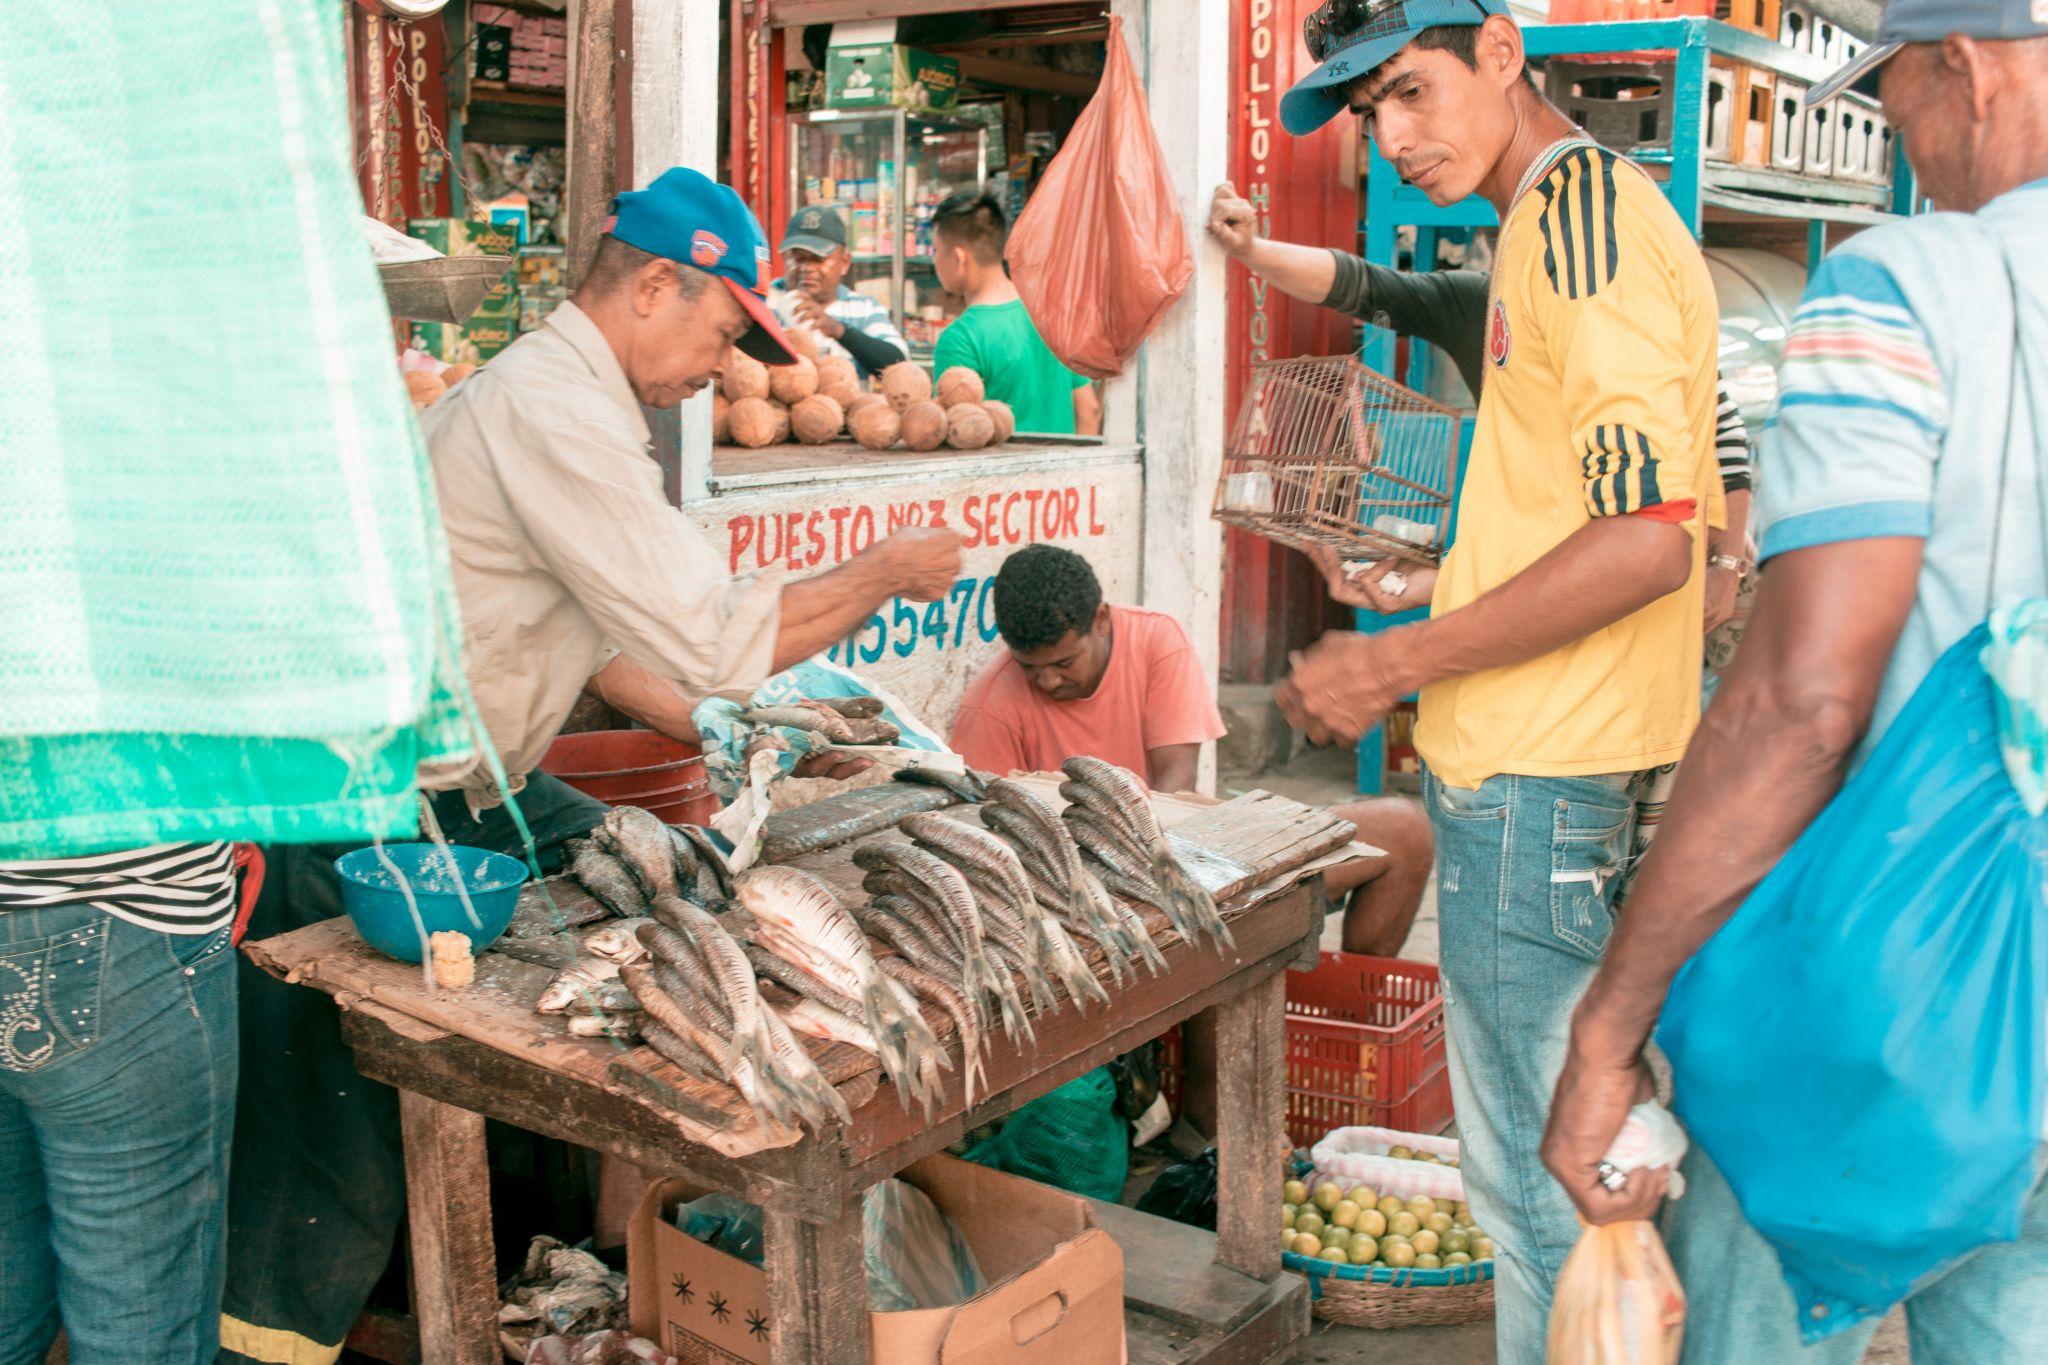 Cartagena Travel Guide Mercado Bazurto Colombia fish stall